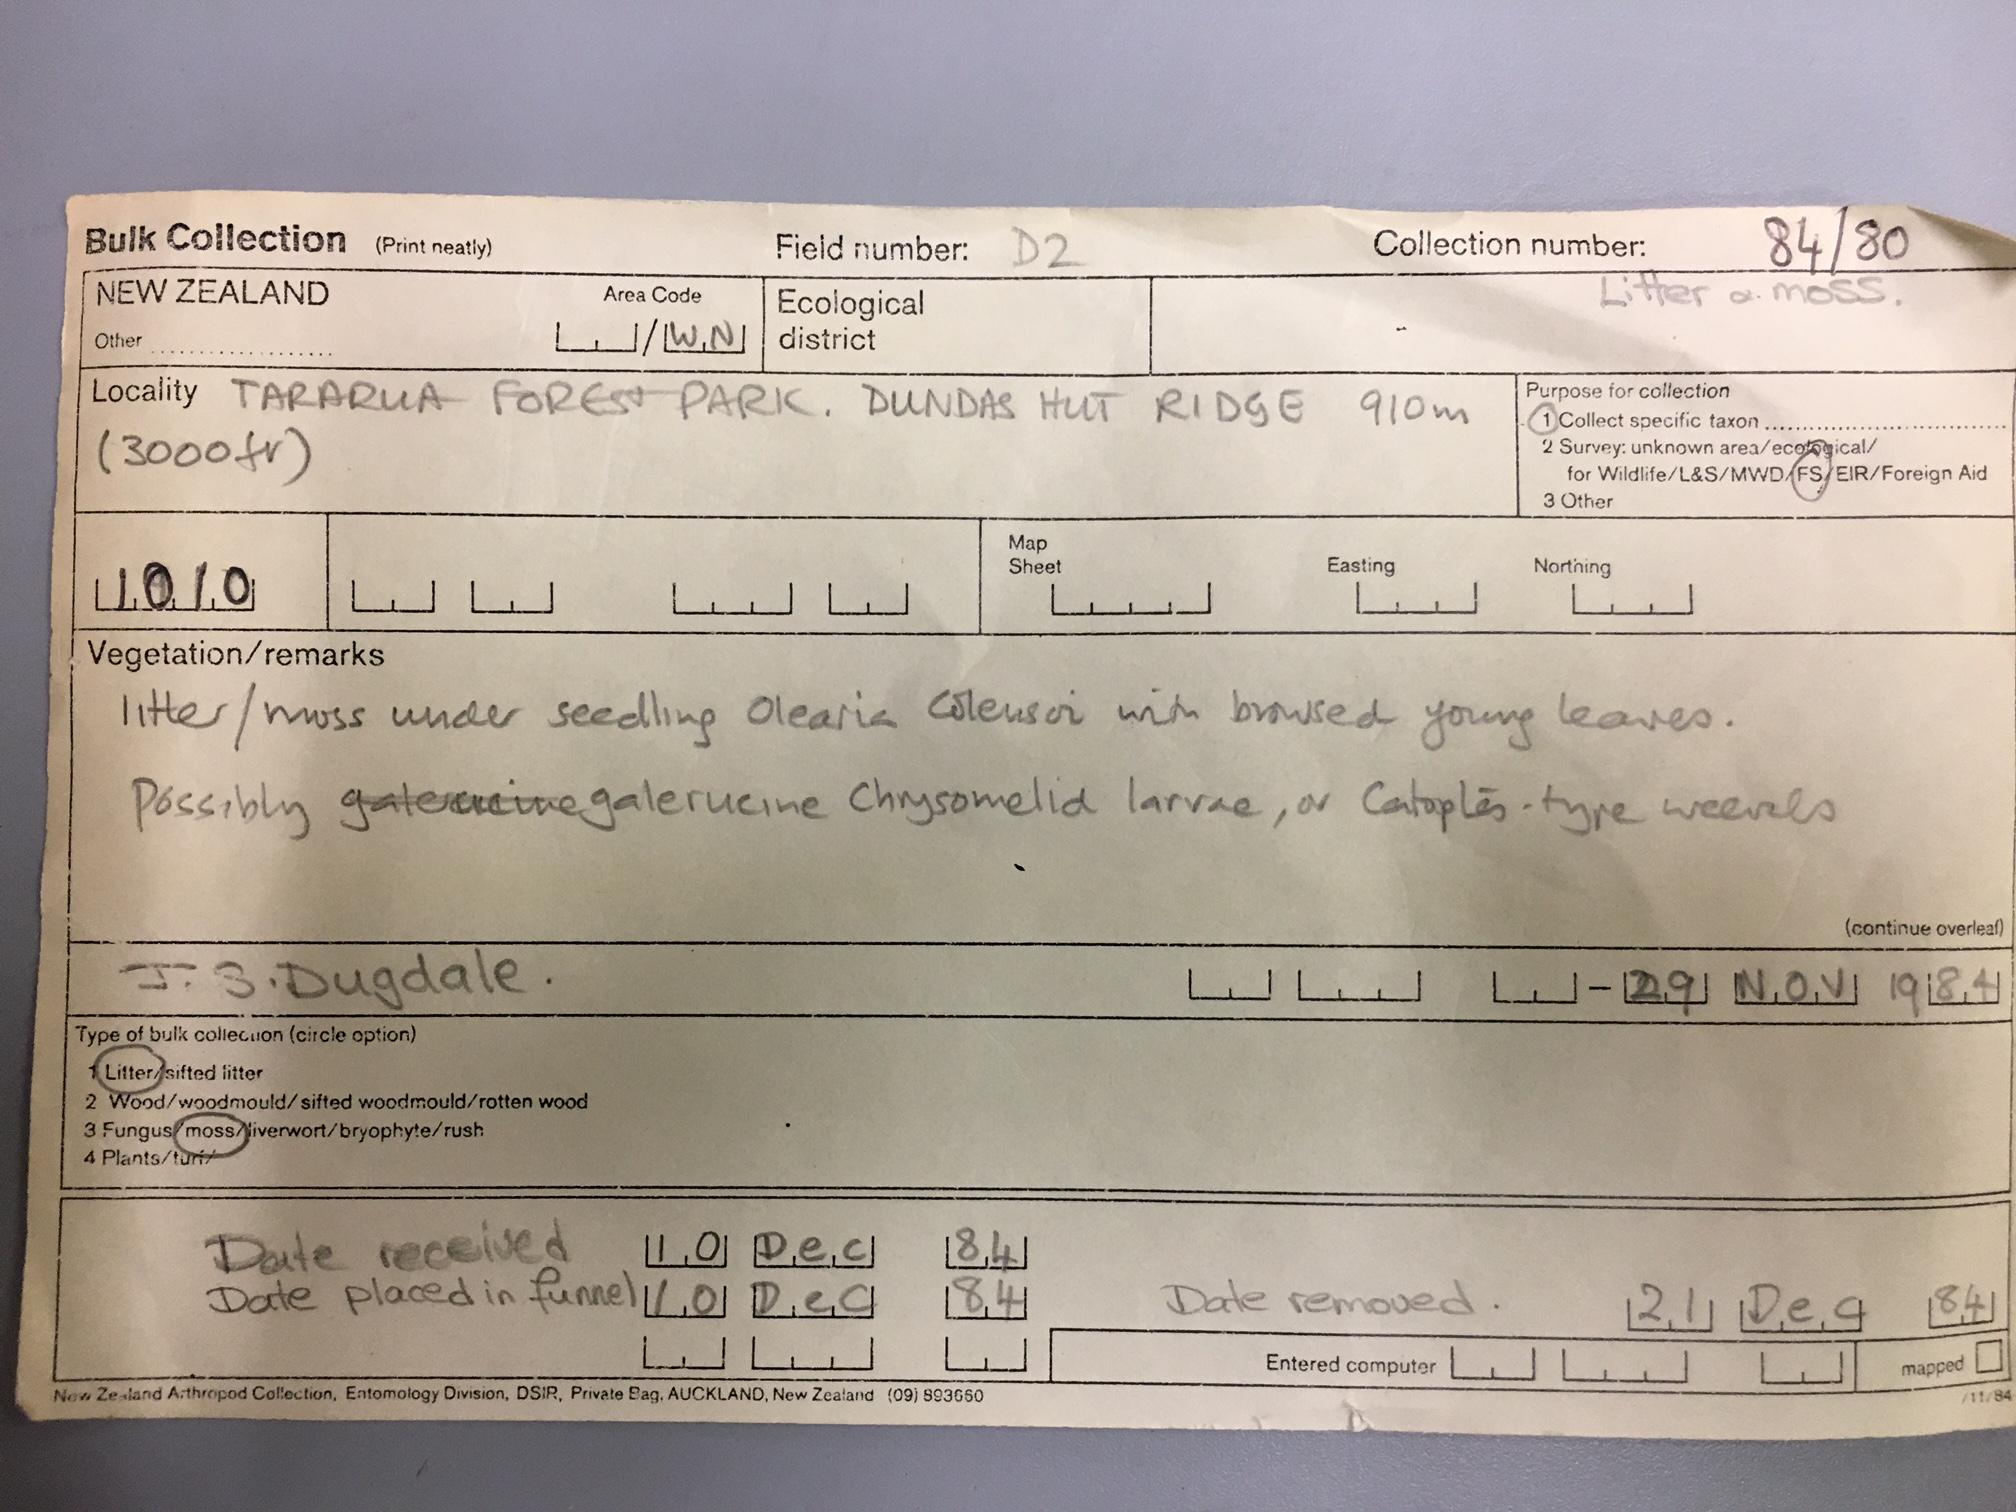 NZAC Litter card - example 1 - Datasets - Manaaki Whenua